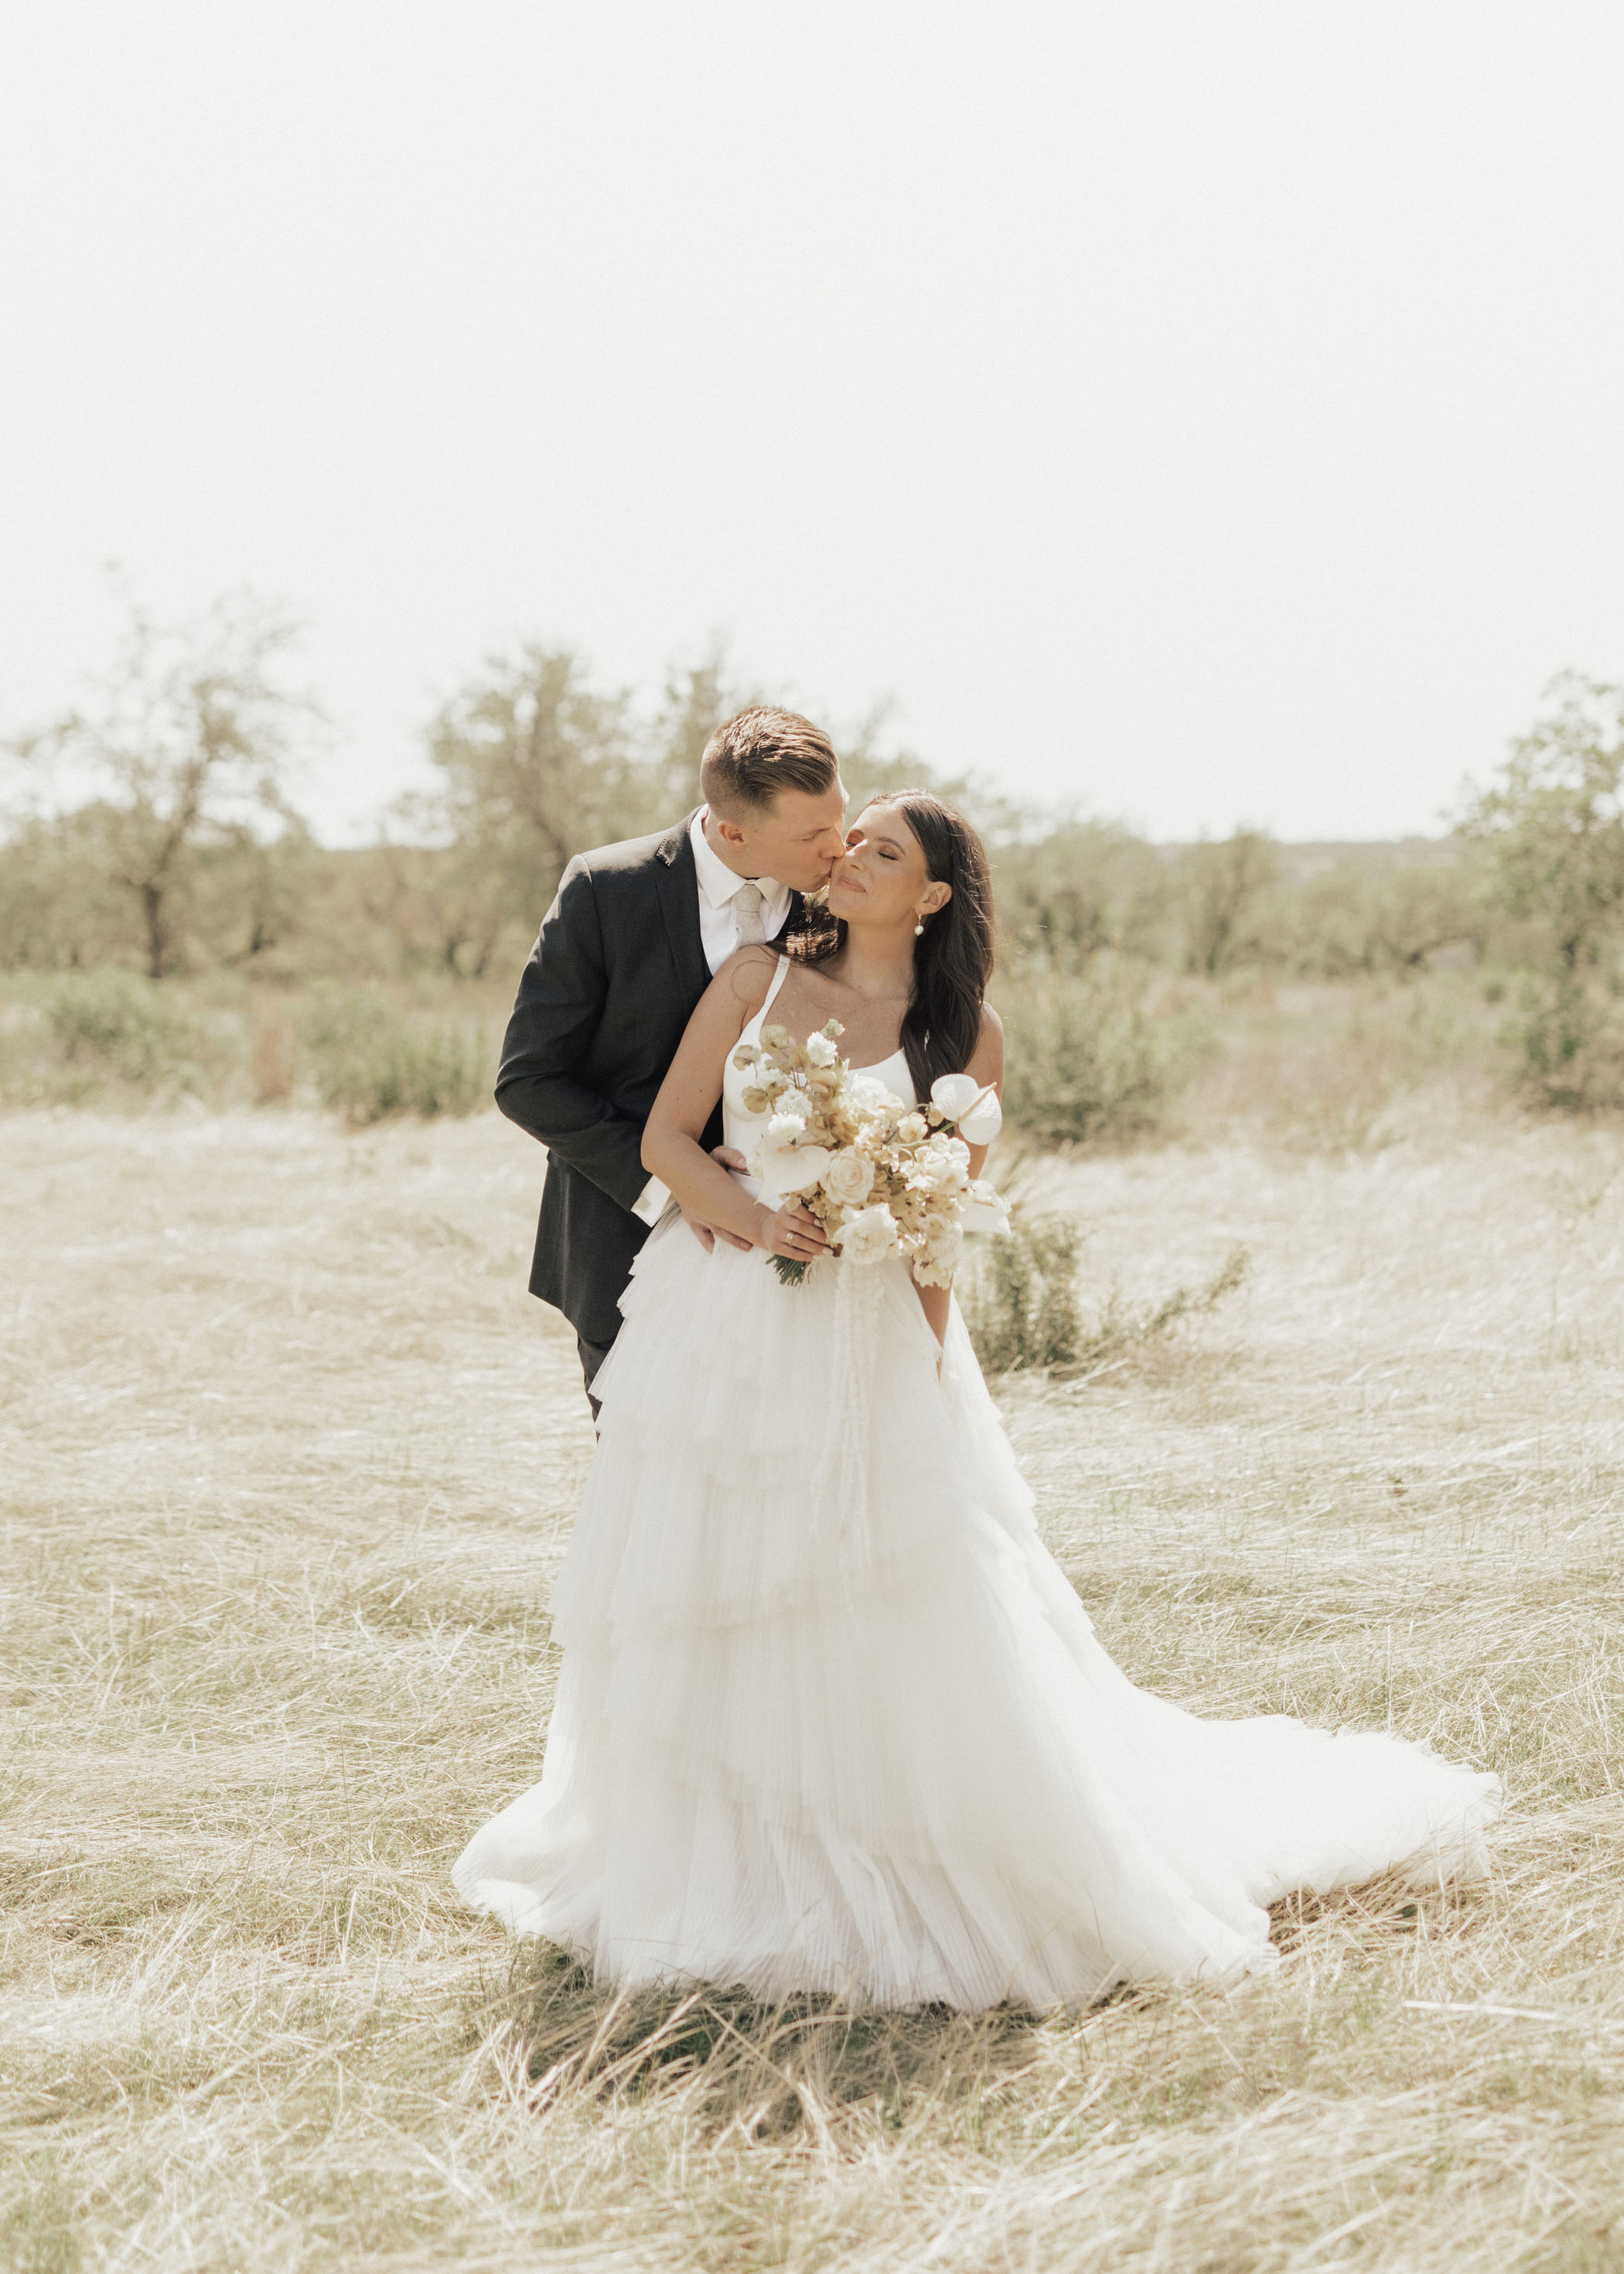 Modern Texas Wedding With Terracotta Neutrals + White Bridesmaids Dresses